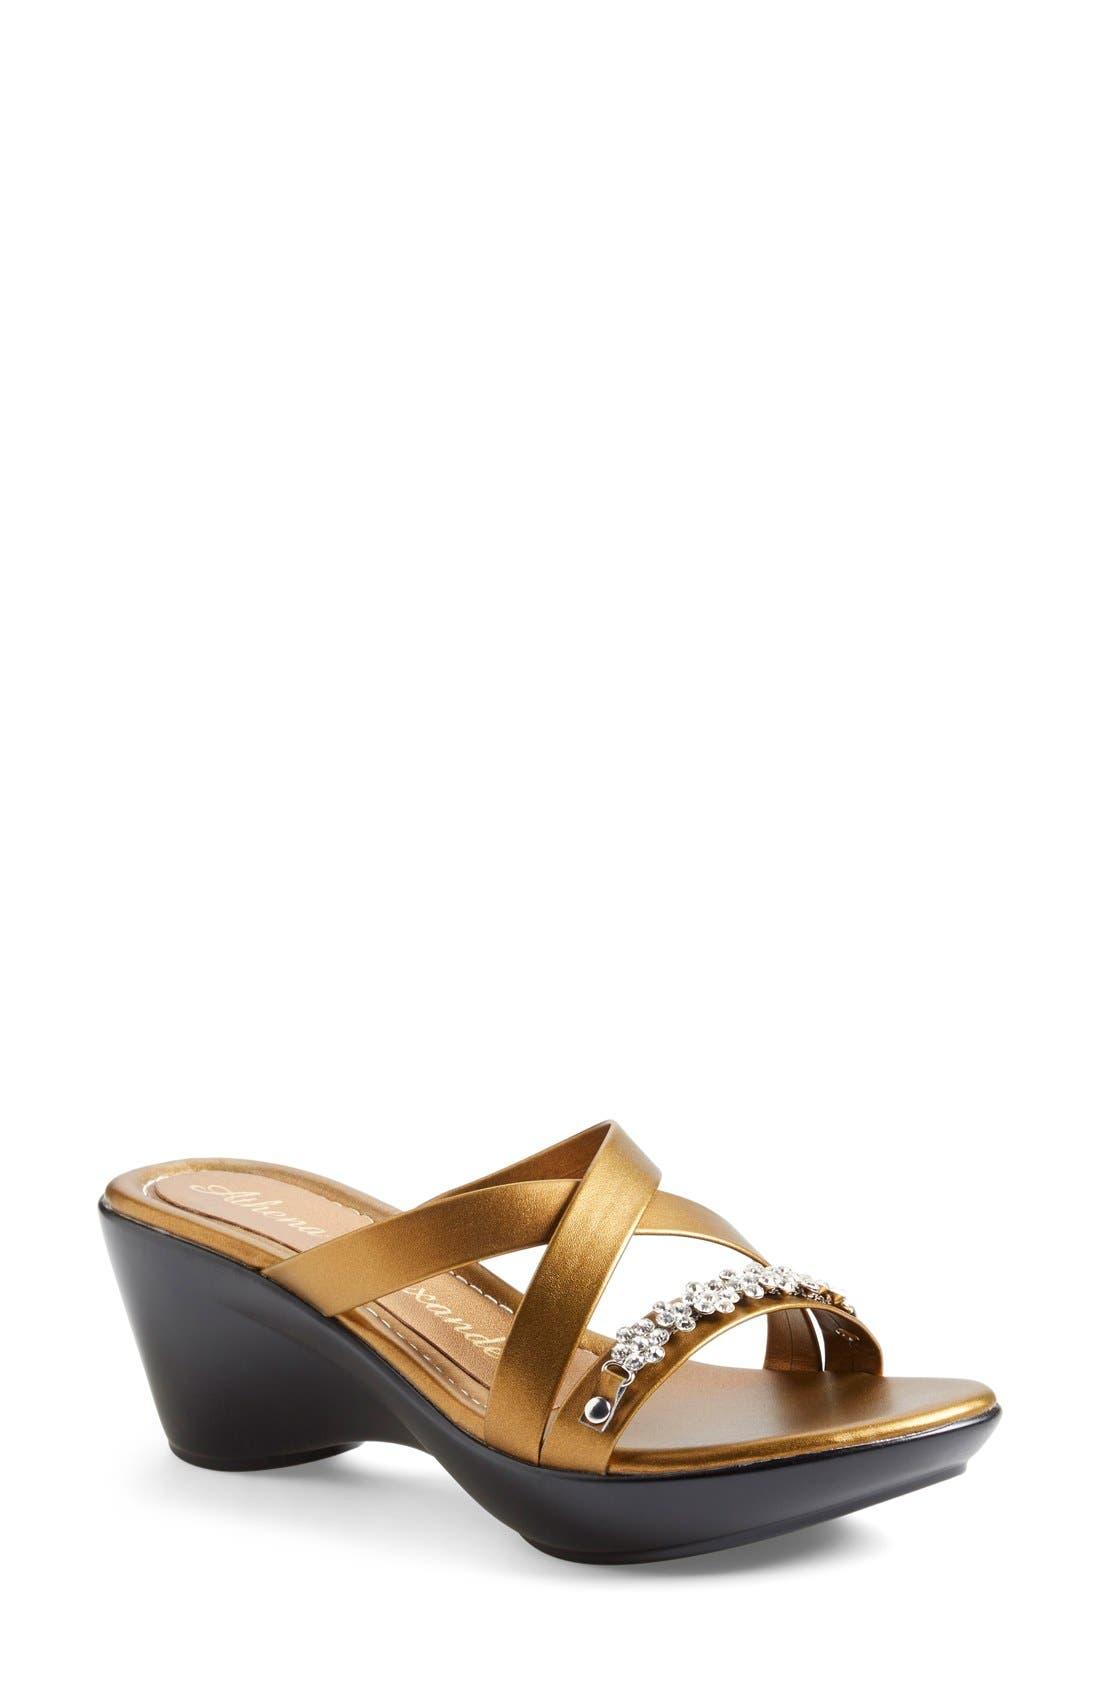 Alternate Image 1 Selected - Athena Alexander 'Tangie' Crystal Embellished Wedge Sandal (Women)